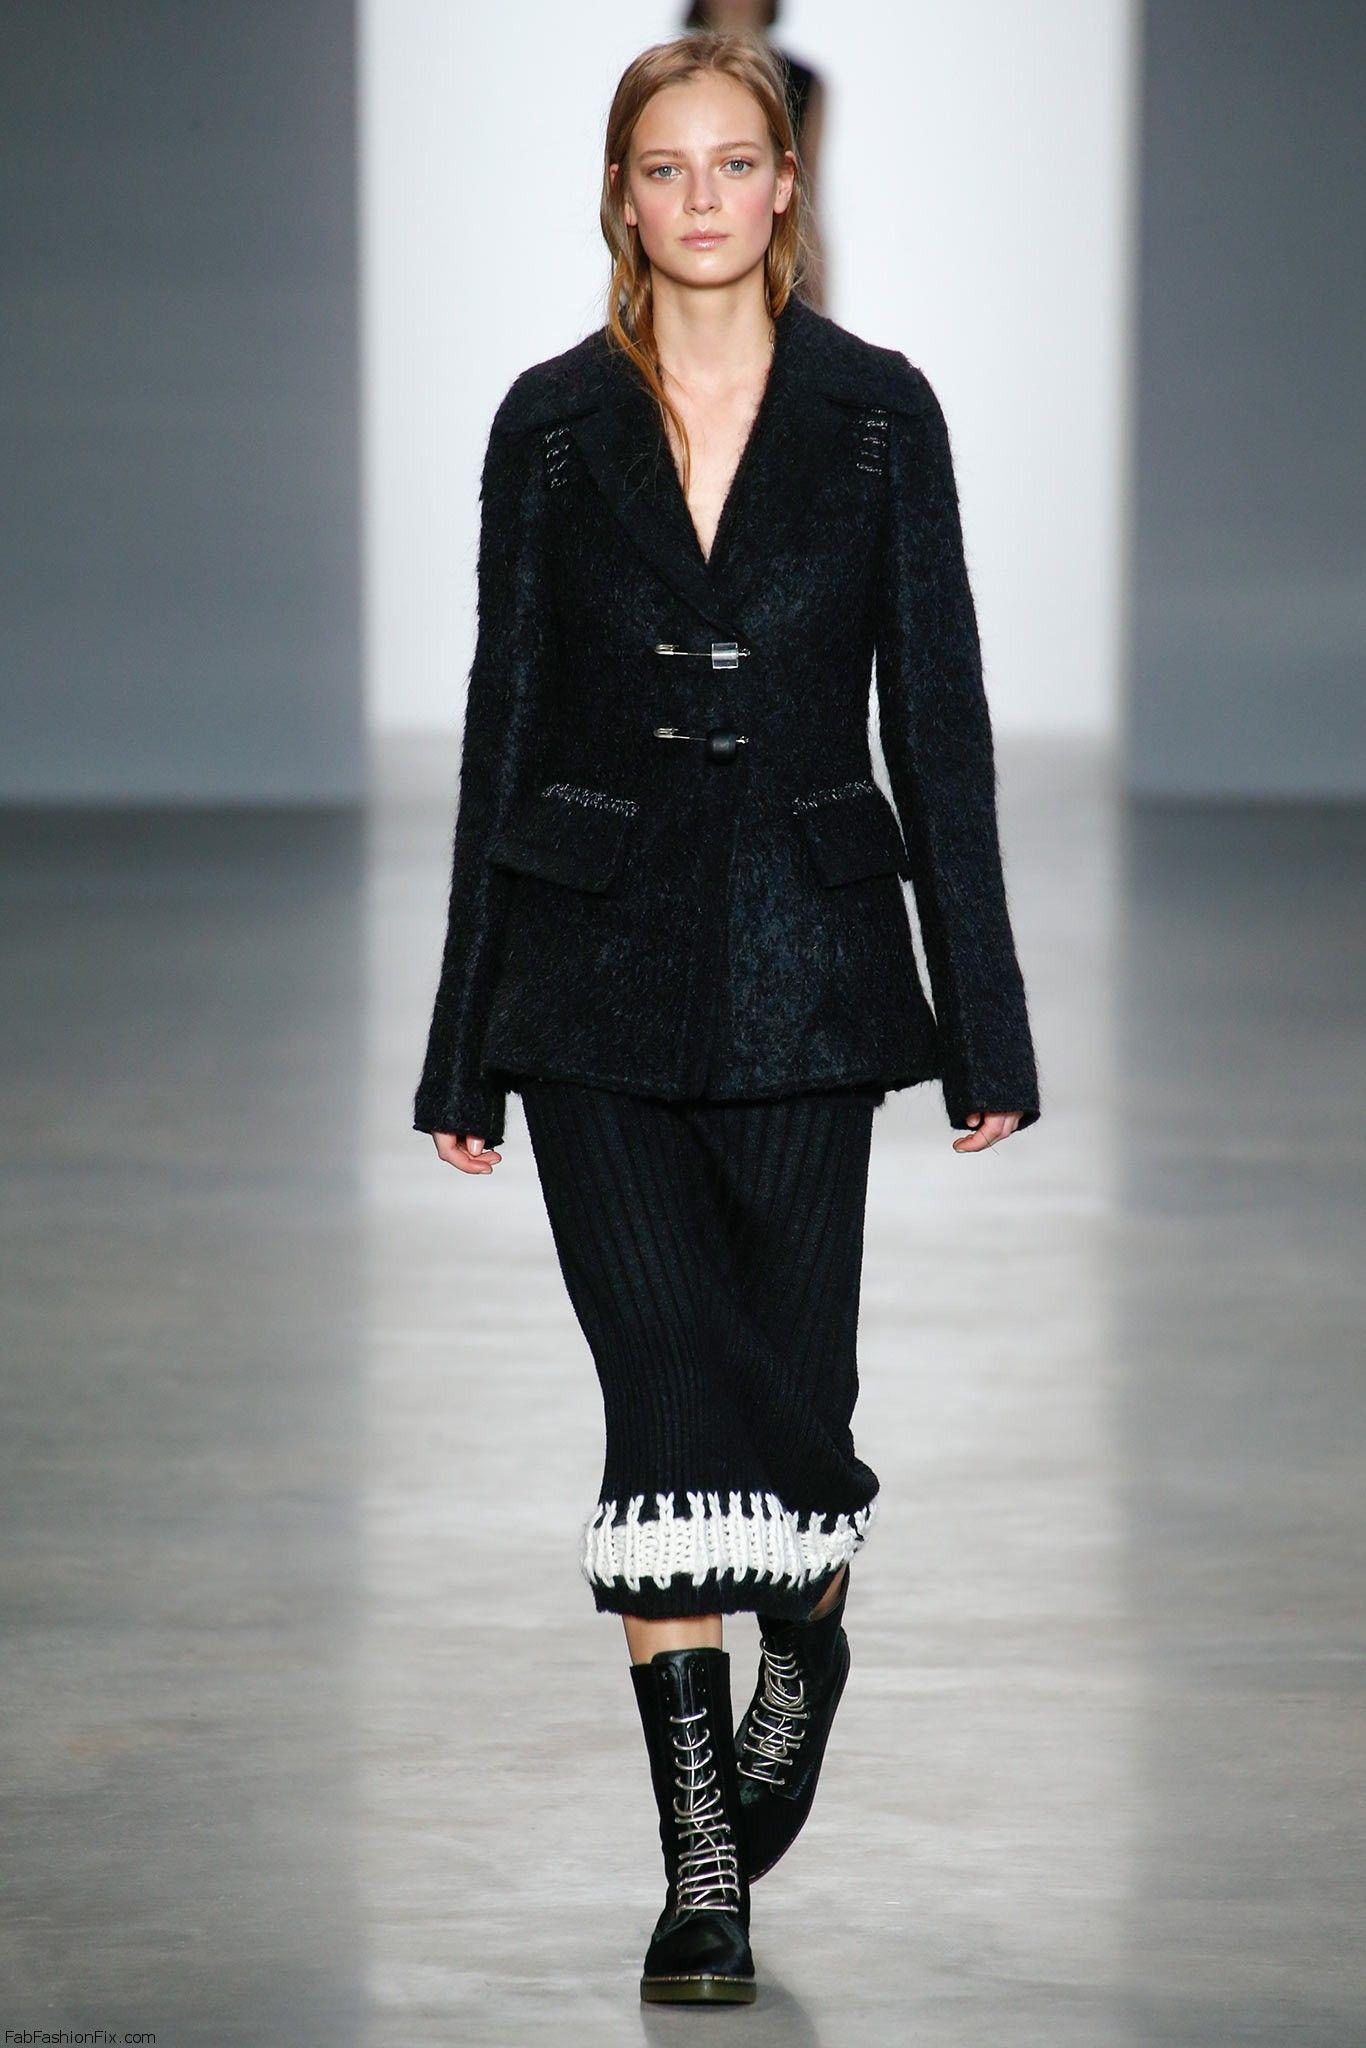 Calvin Klein Collection Fall Winter 2014 Collection New